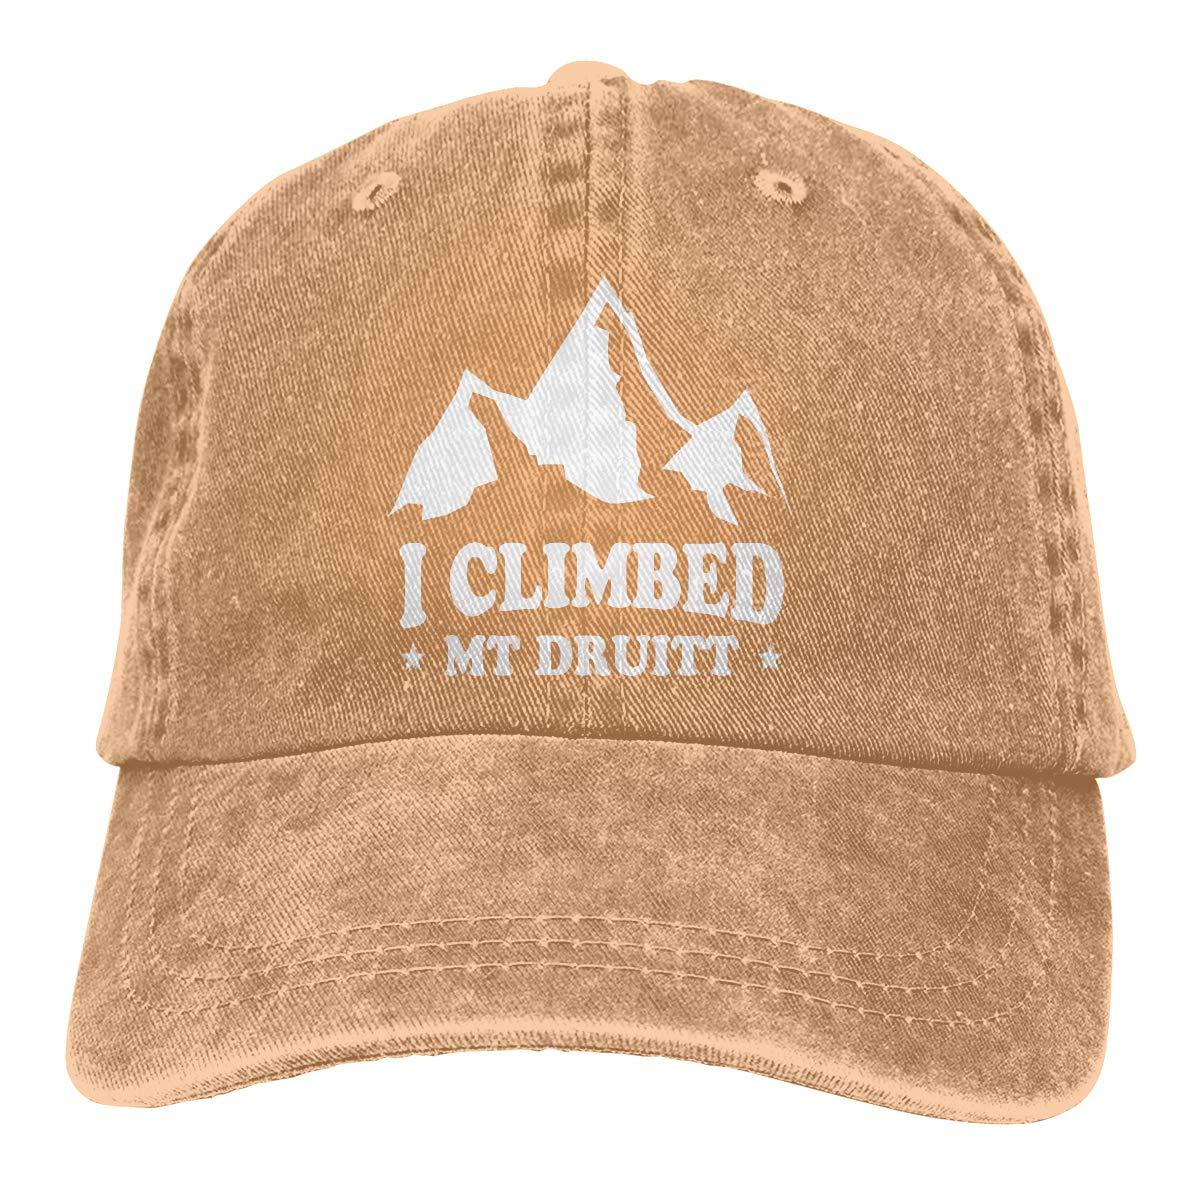 PMGM-C I Climbed MT Druitt Unisex Trendy Cowboy Hat Outdoor Sports Hat Adjustable Baseball Cap